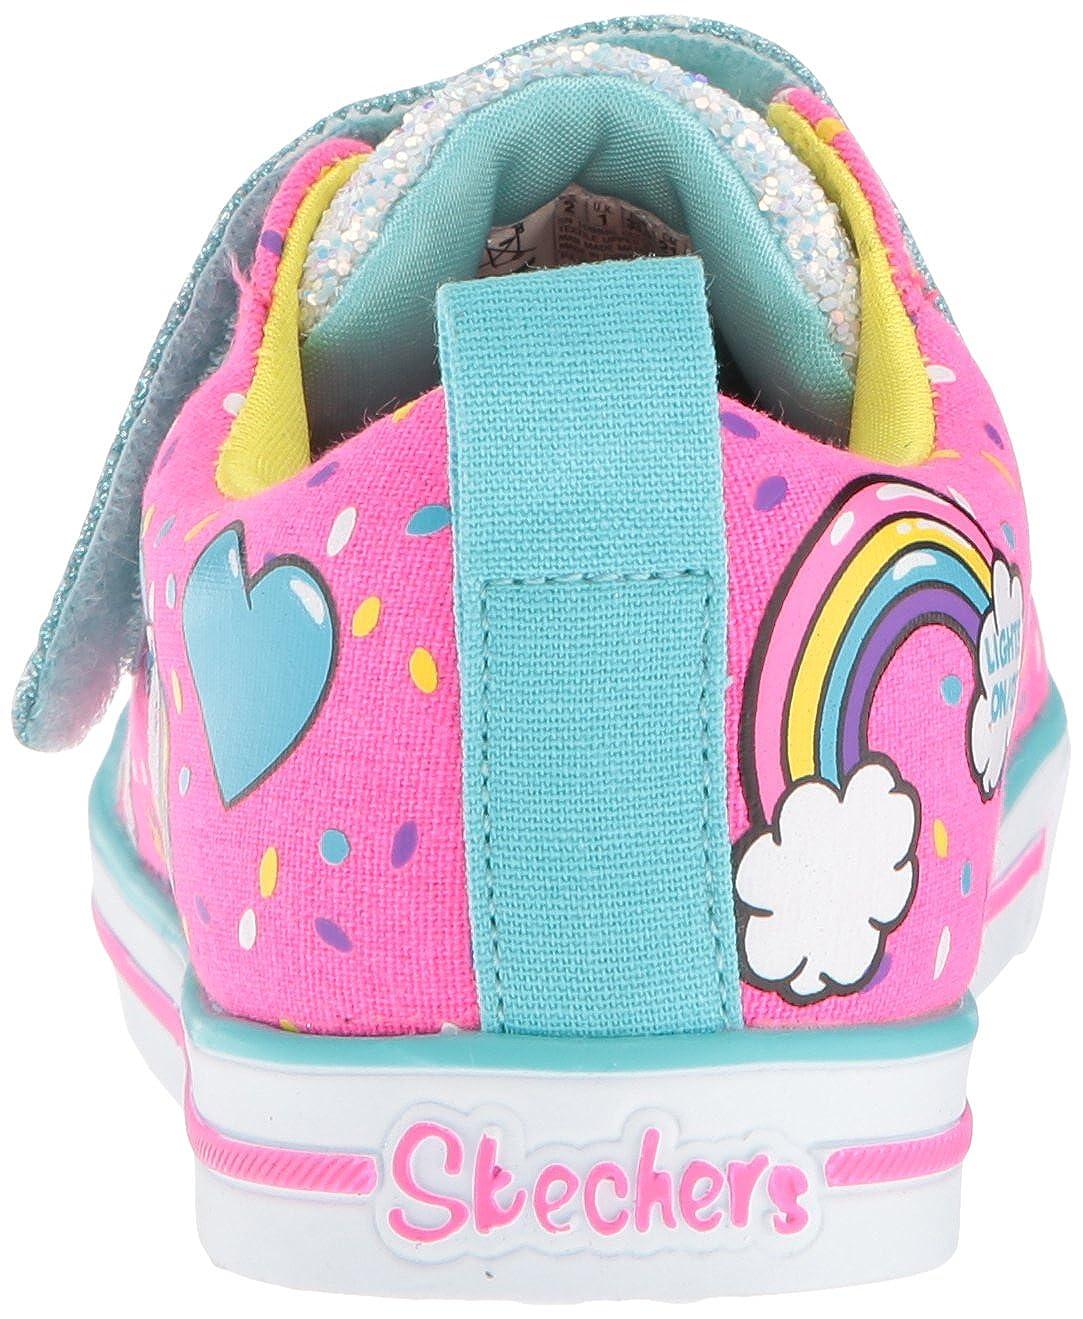 Skechers TT Sparkle Lite Unicorn Craze Girls Casual Shoes